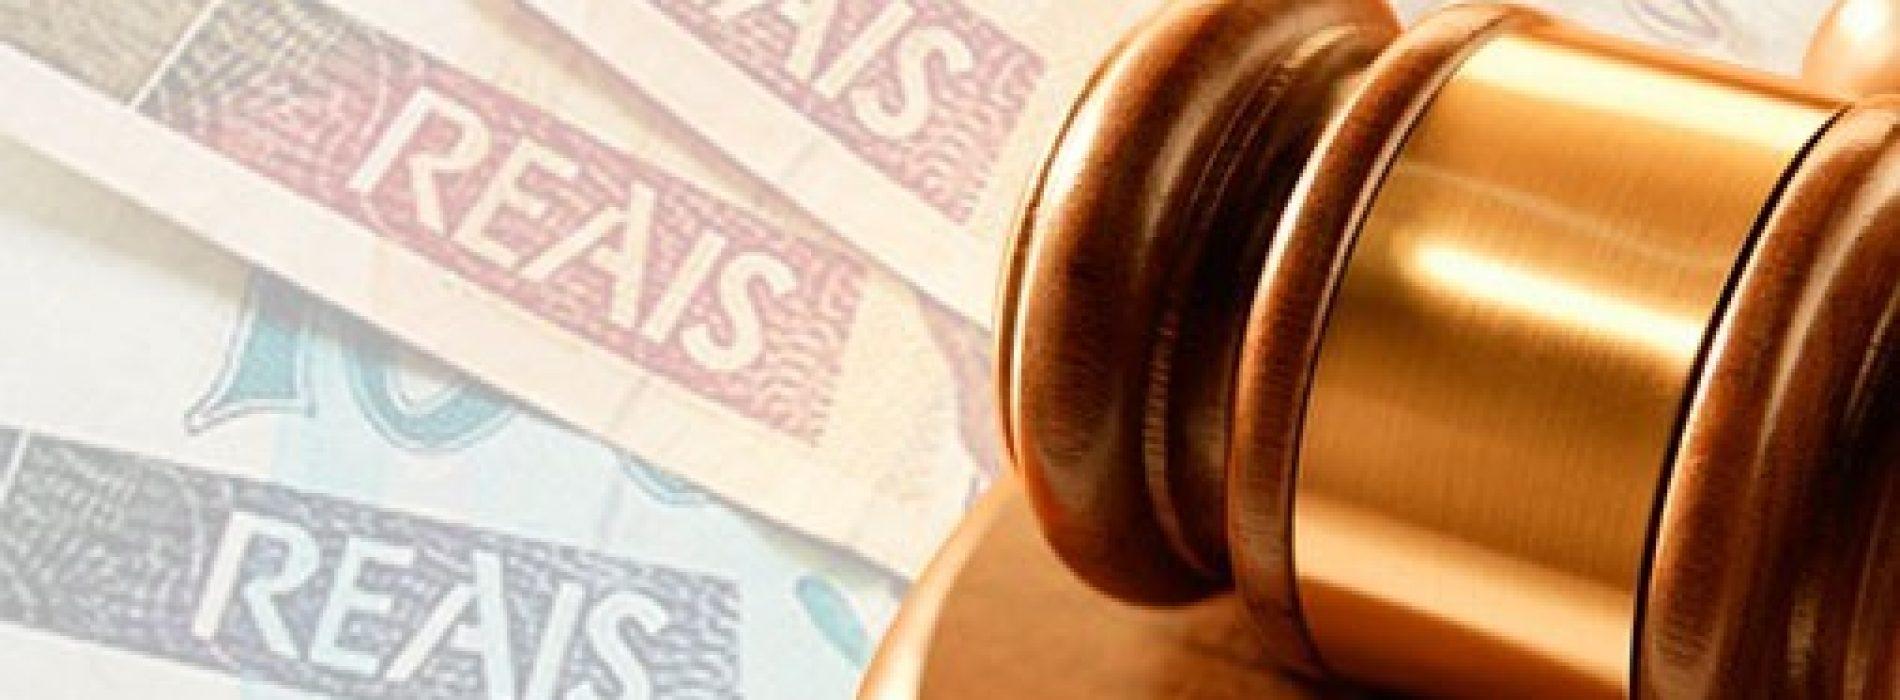 Justiça condena escola a pagar 30 mil reais a família de aluna.